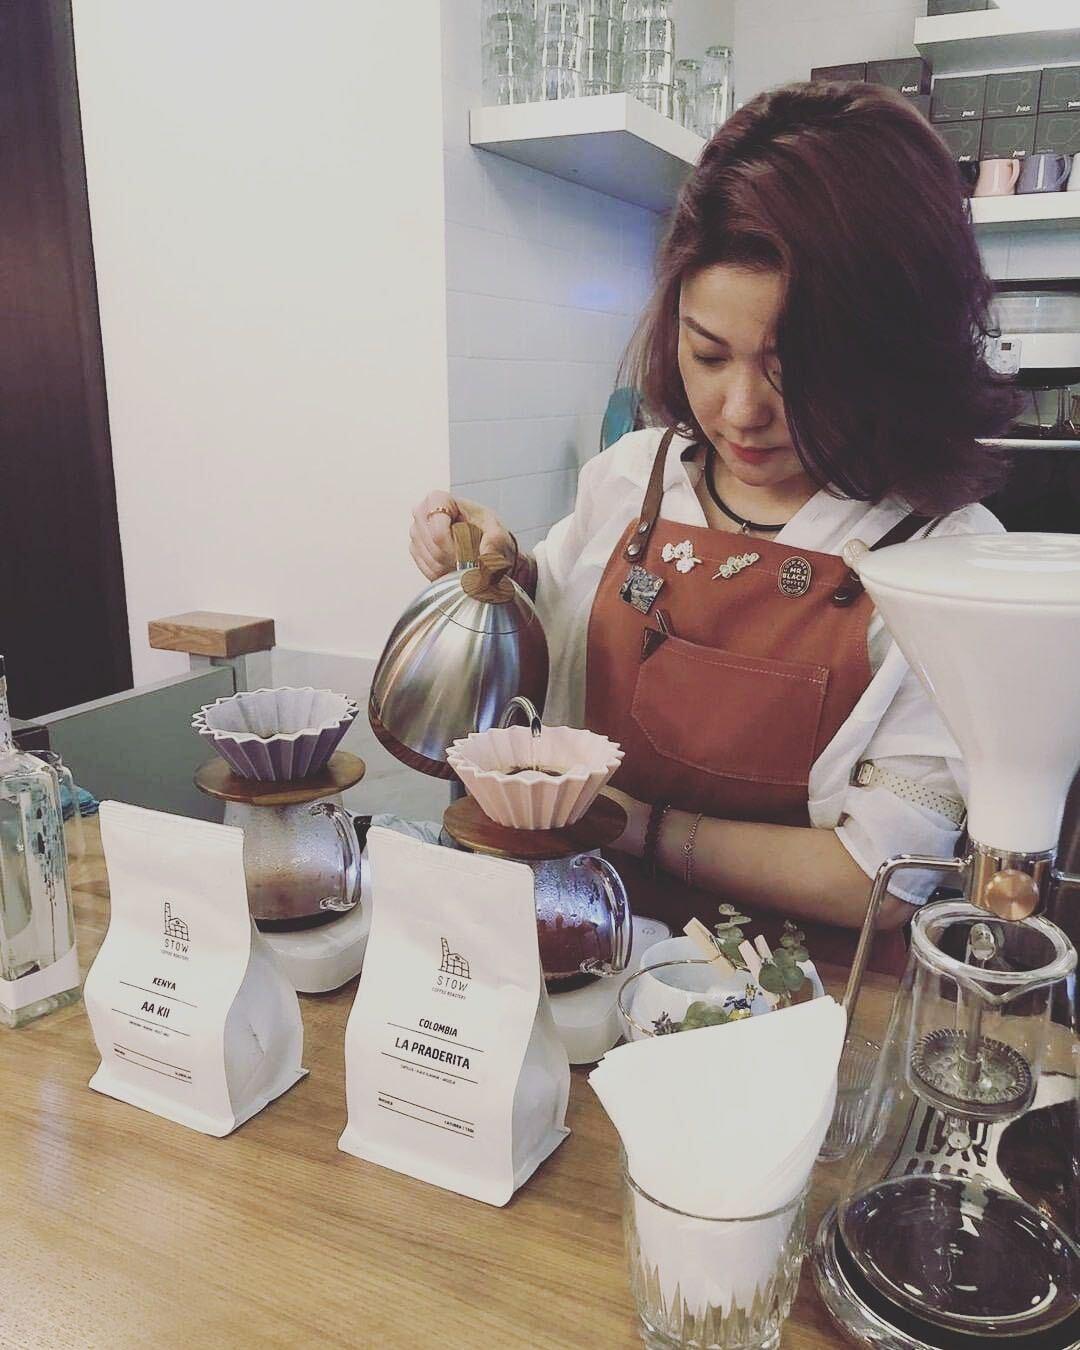 Mandy Mok在咖啡店沖咖啡 練習咖啡比賽-咖啡師入行學沖咖啡-咖啡師學徒人工-免費咖啡師課程